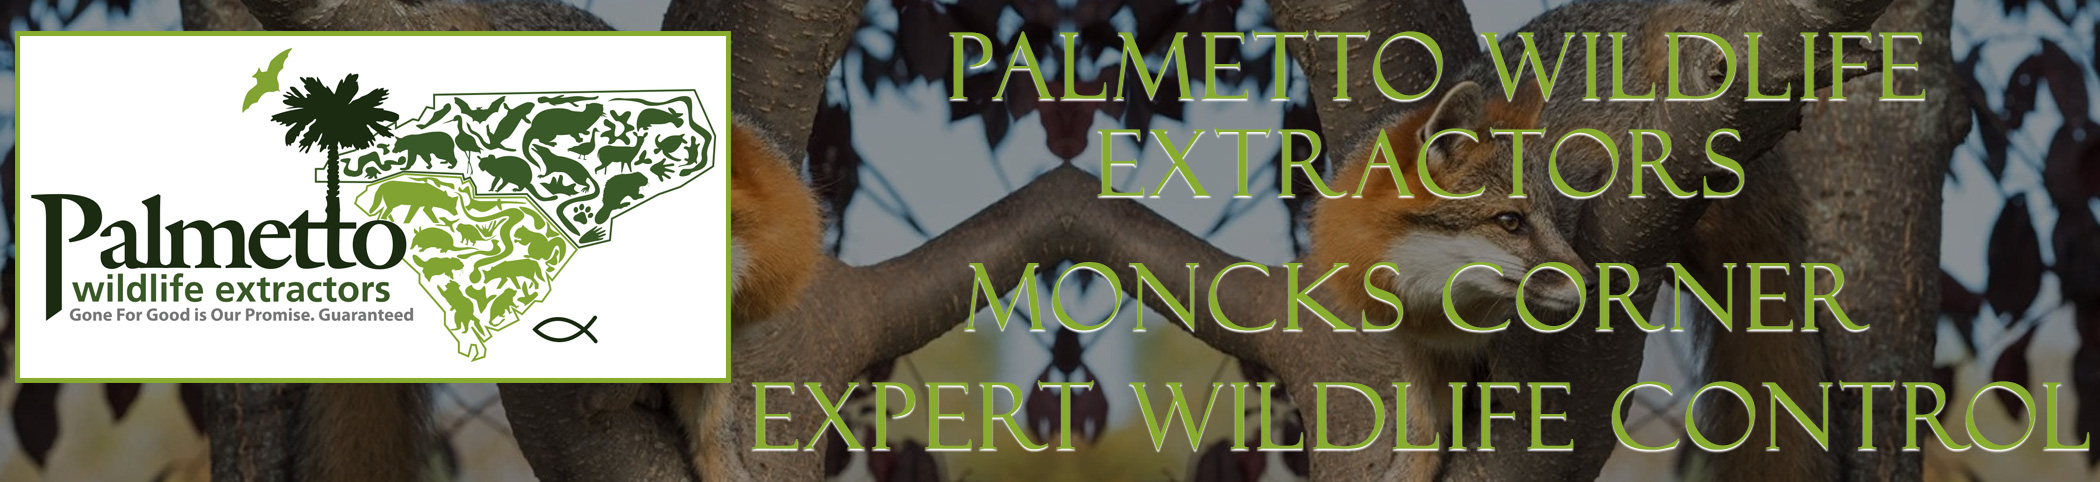 Palmetto Wildlife Extractors Moncks Corner South Carolina header image